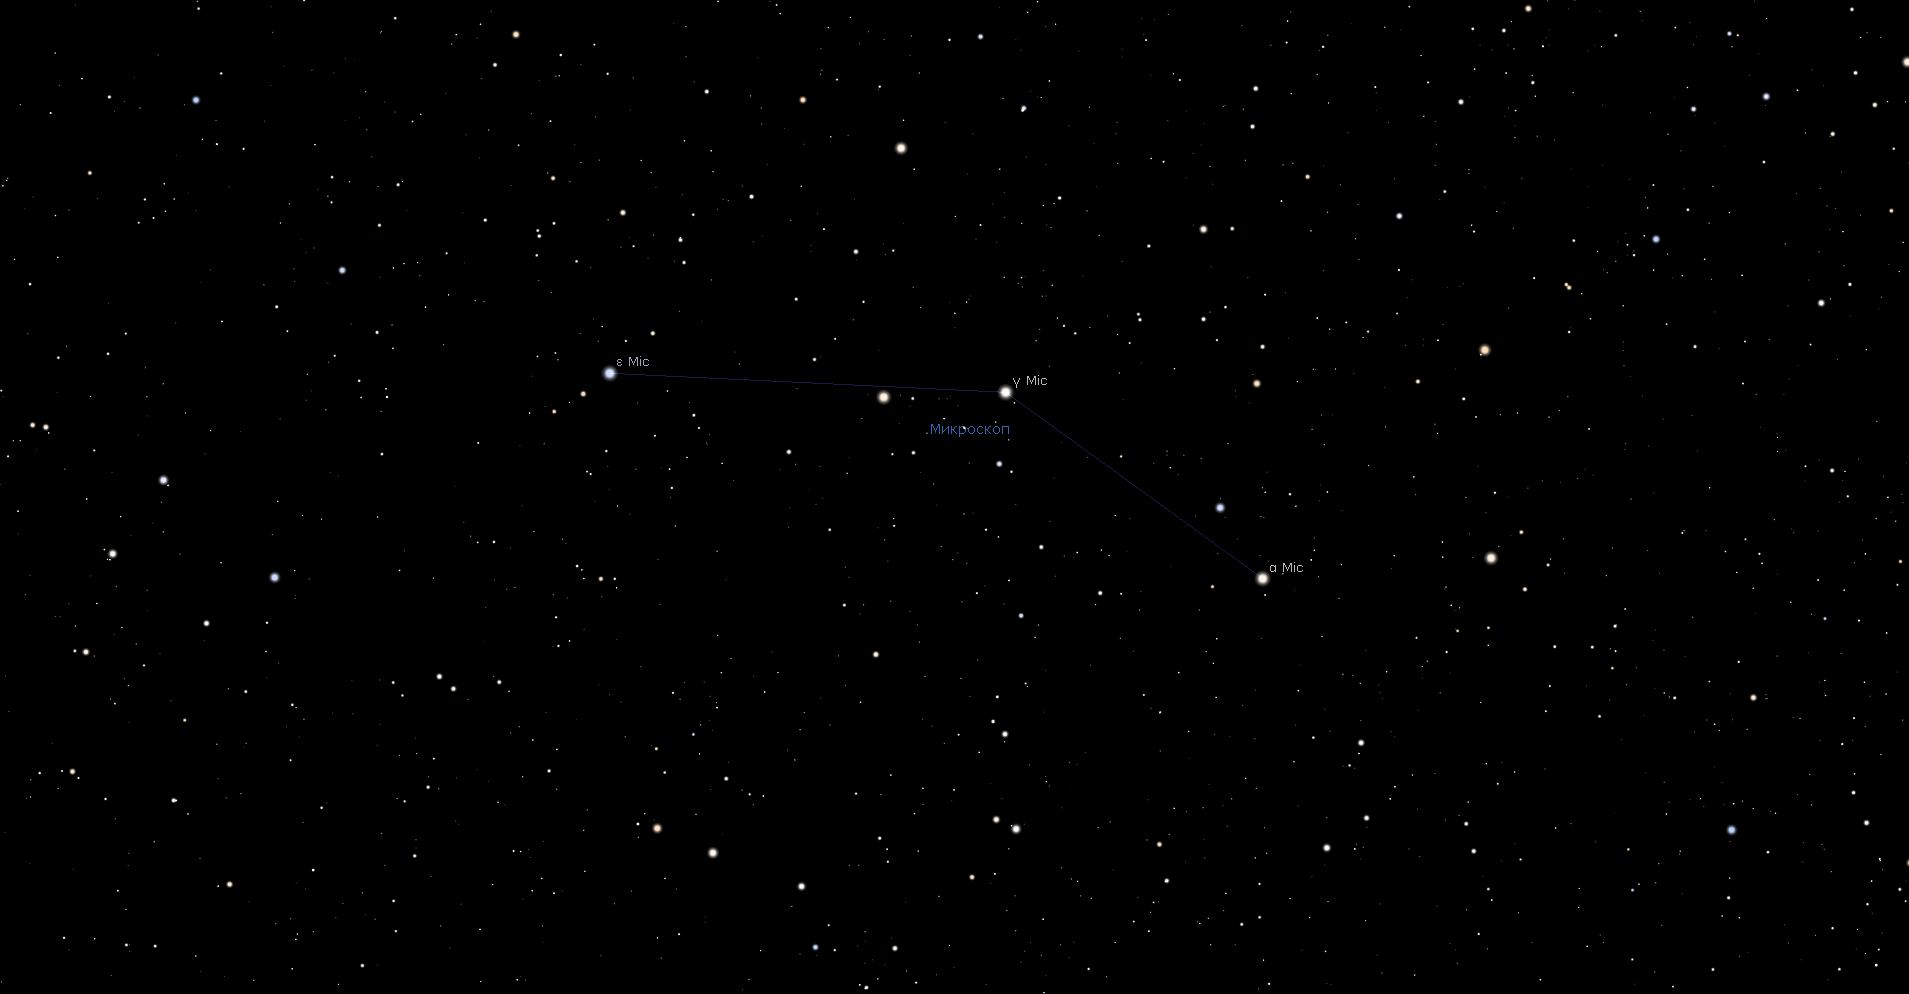 Созвездие Микроскоп, вид в программу планетарий Stellarium